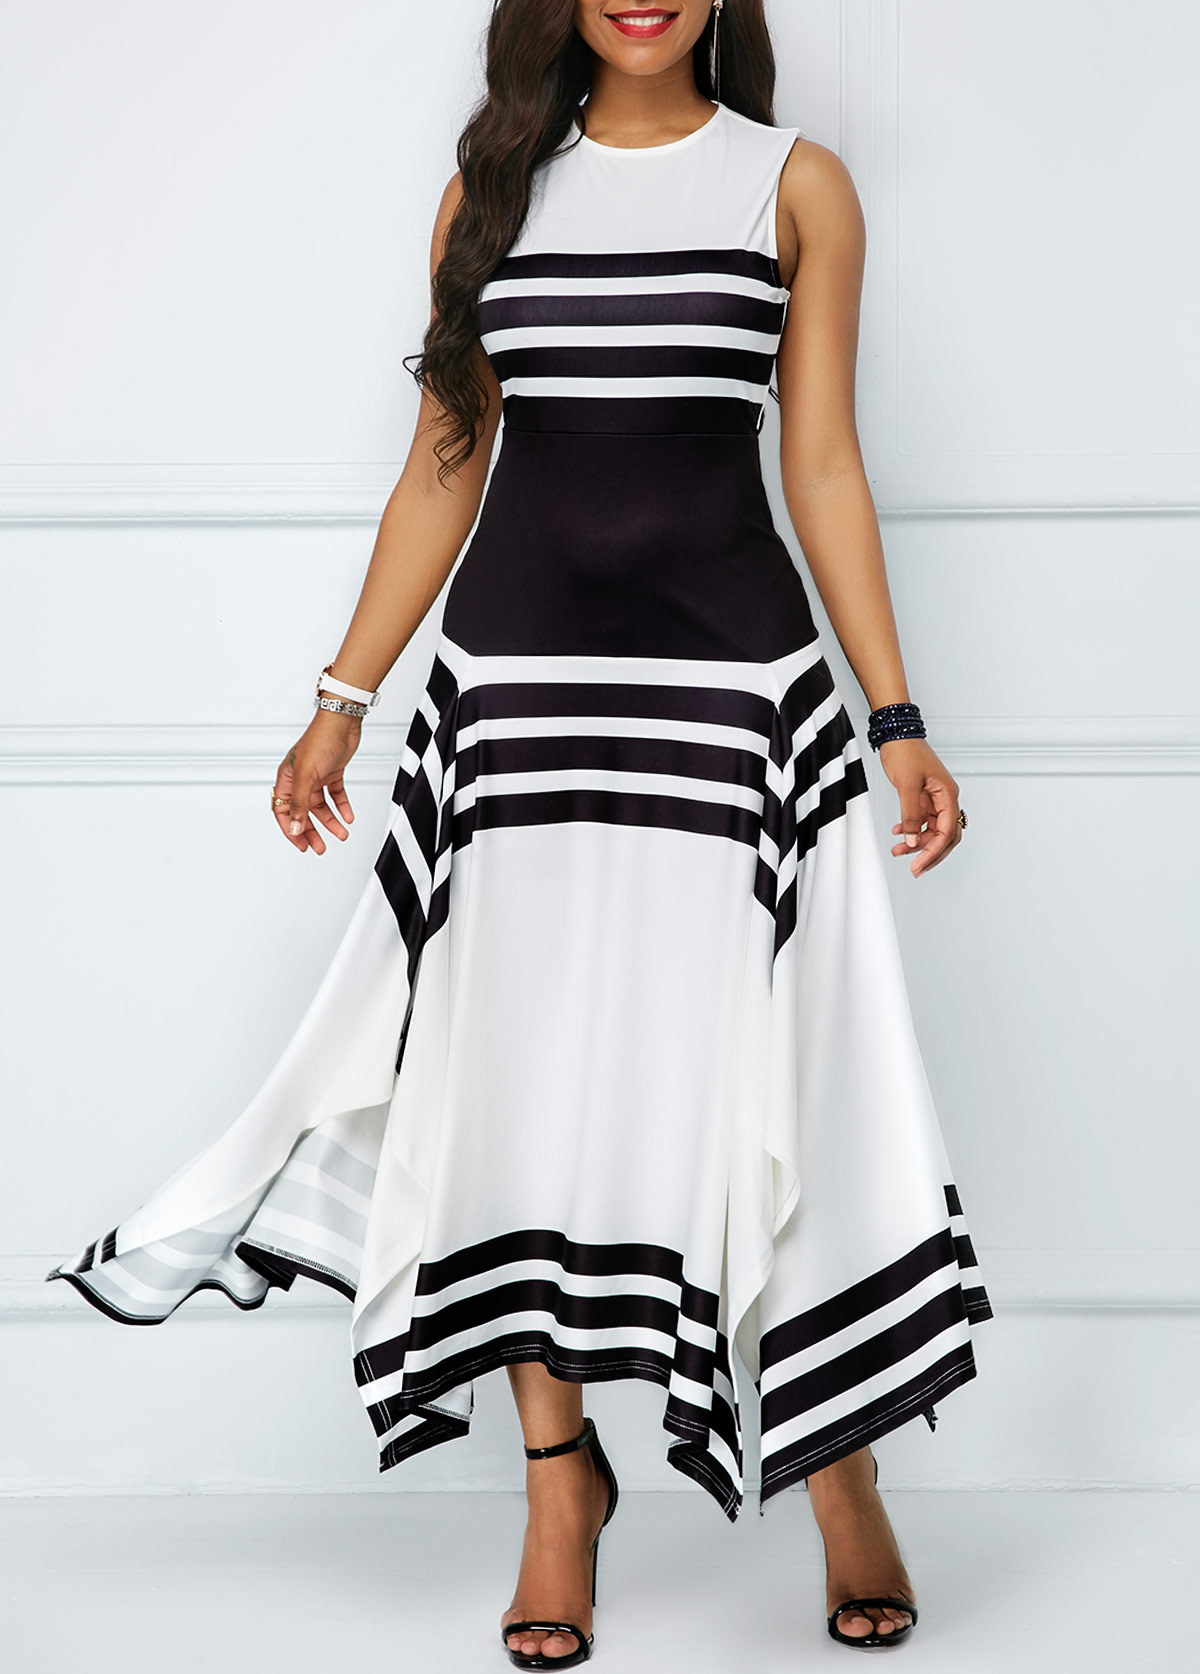 New Women Sleeve Less O-neck Black White Stripes Irregular Hem A-line Long Maxi Dress Fashion Casual Vestidos 2 Colors A6077